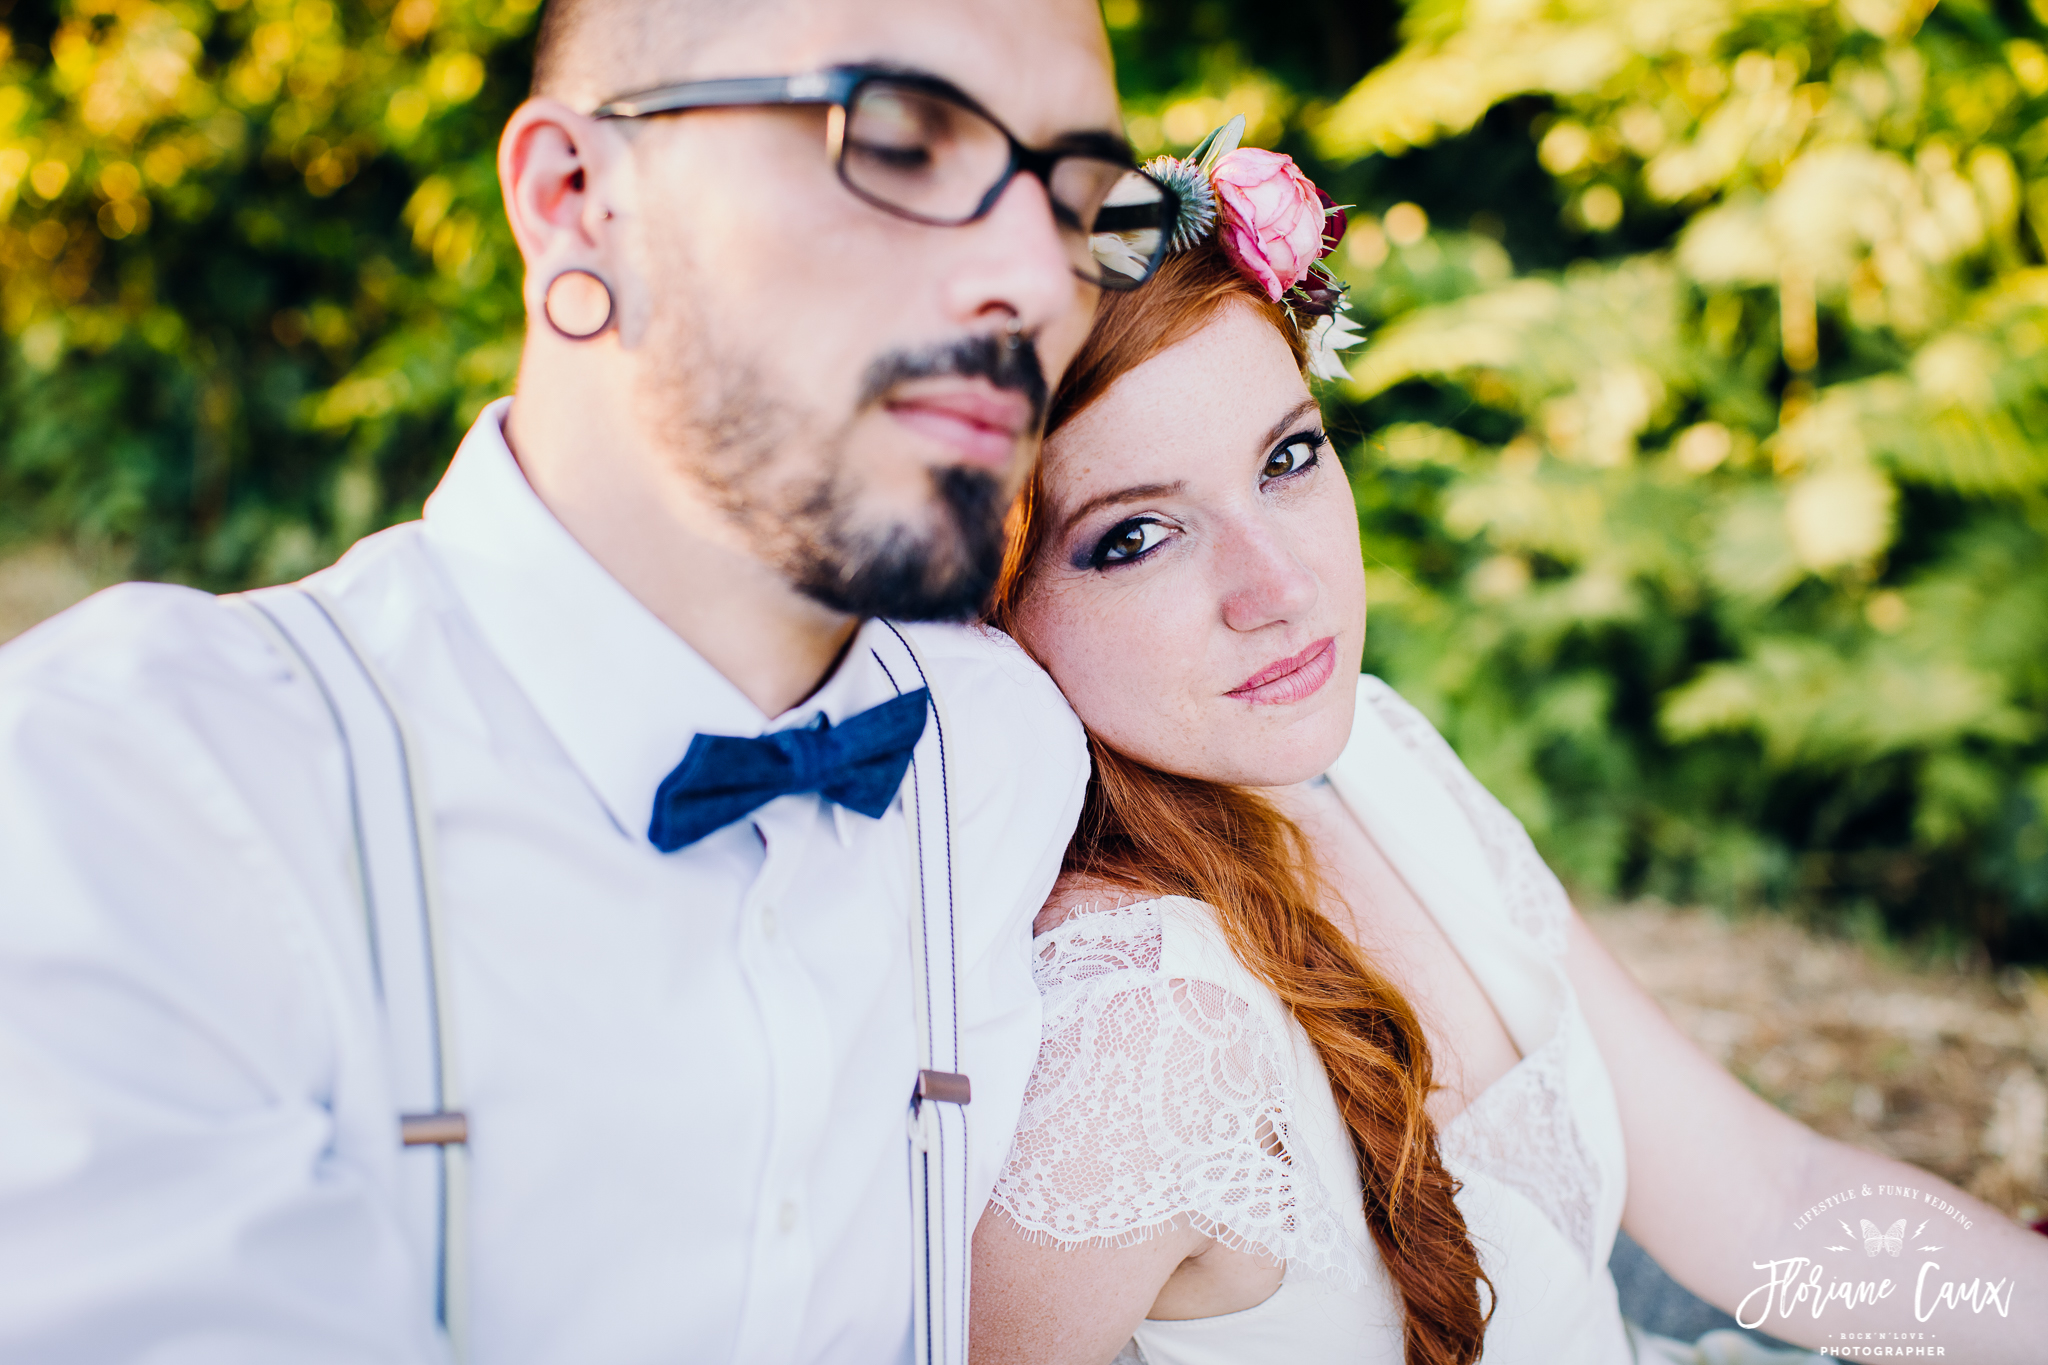 photographe-mariage-toulouse-rocknroll-maries-tatoues-floriane-caux-77